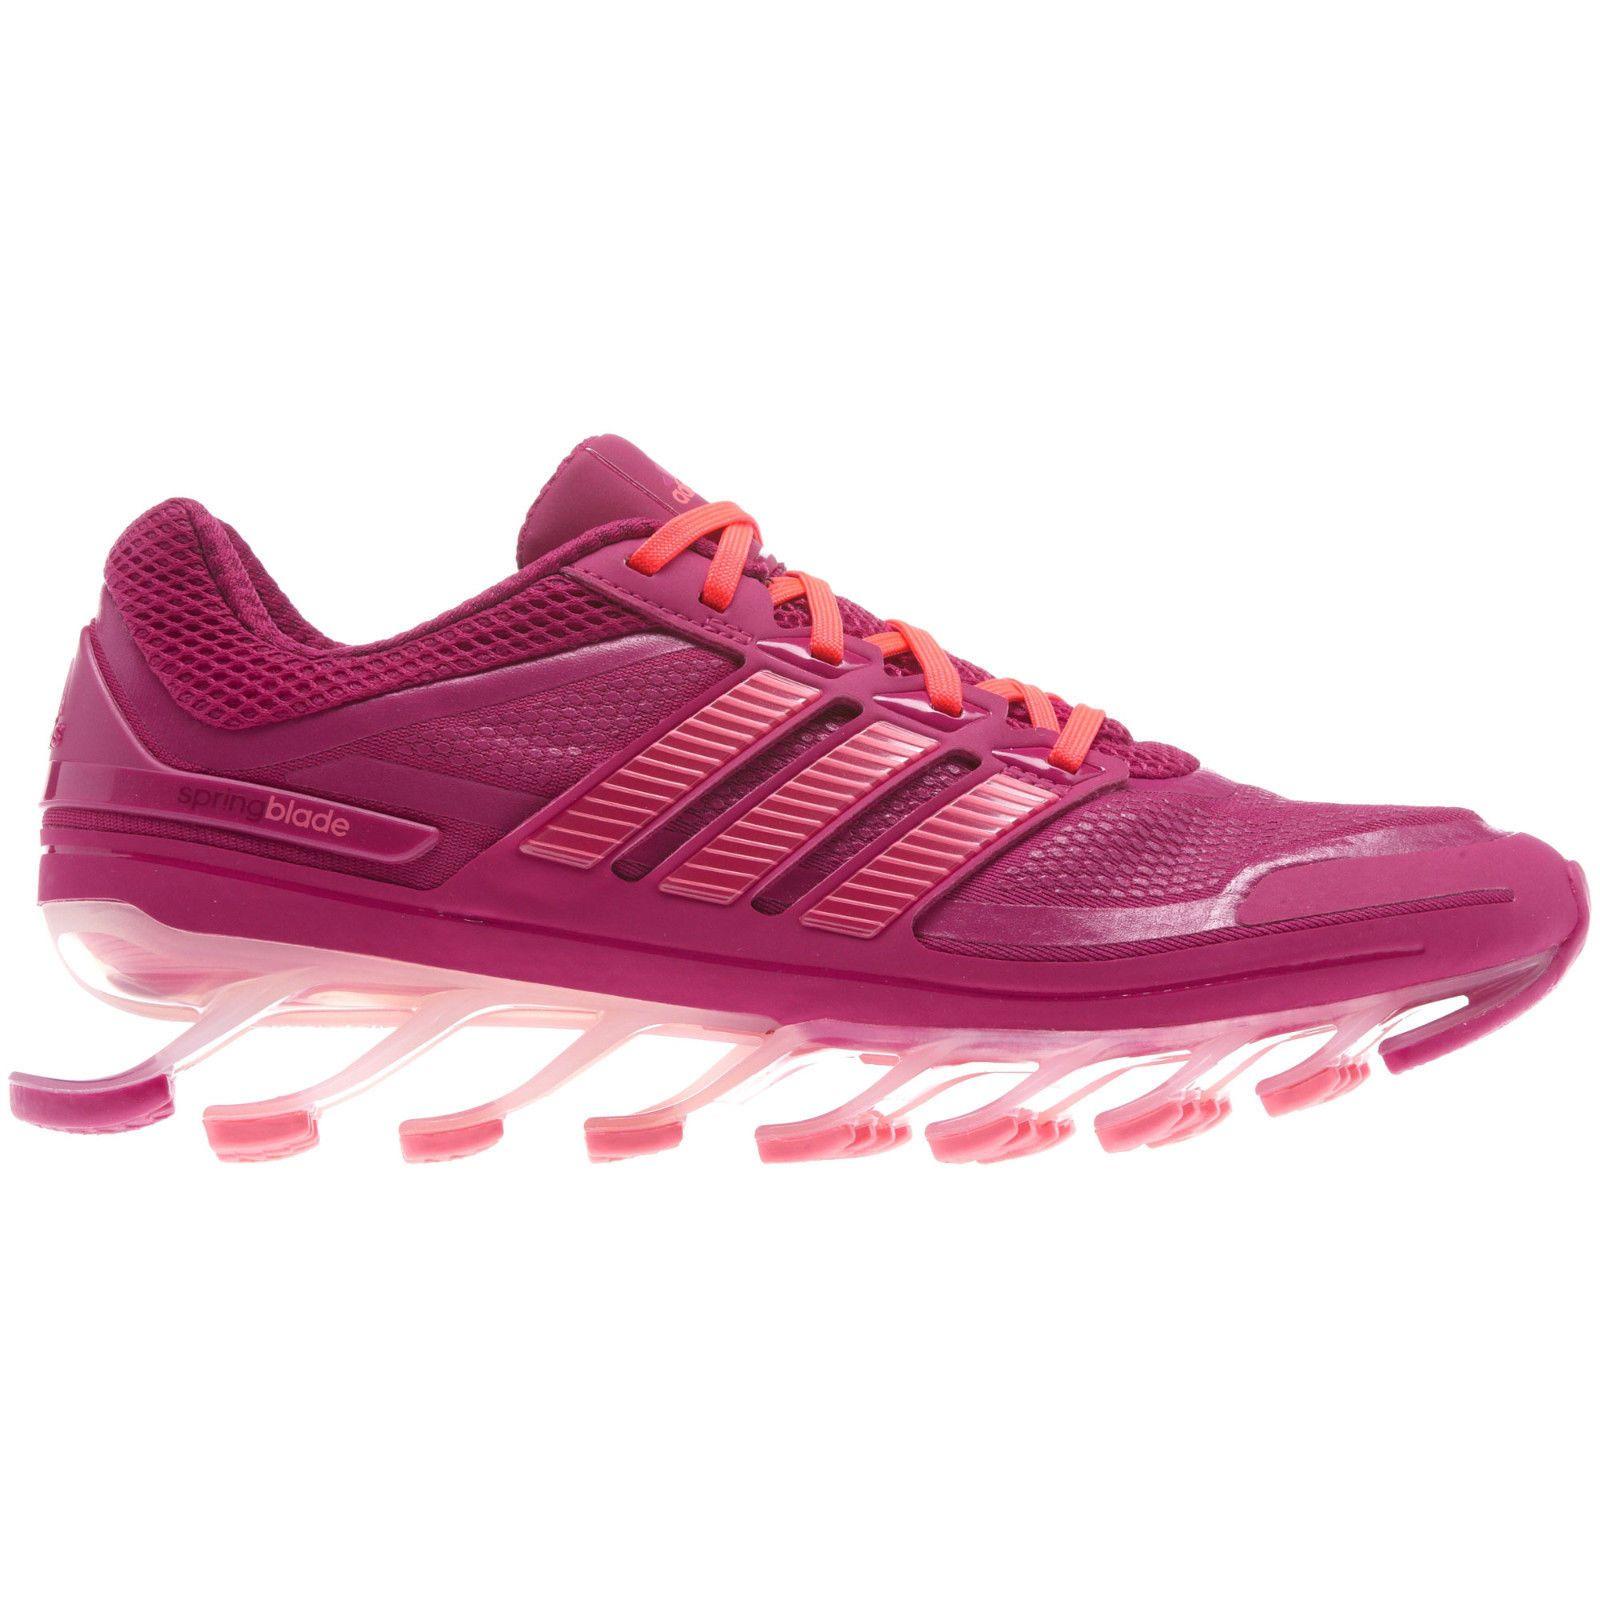 nuove donne springblade scarpe adidas magenta / rosa caldo dimensioni 6